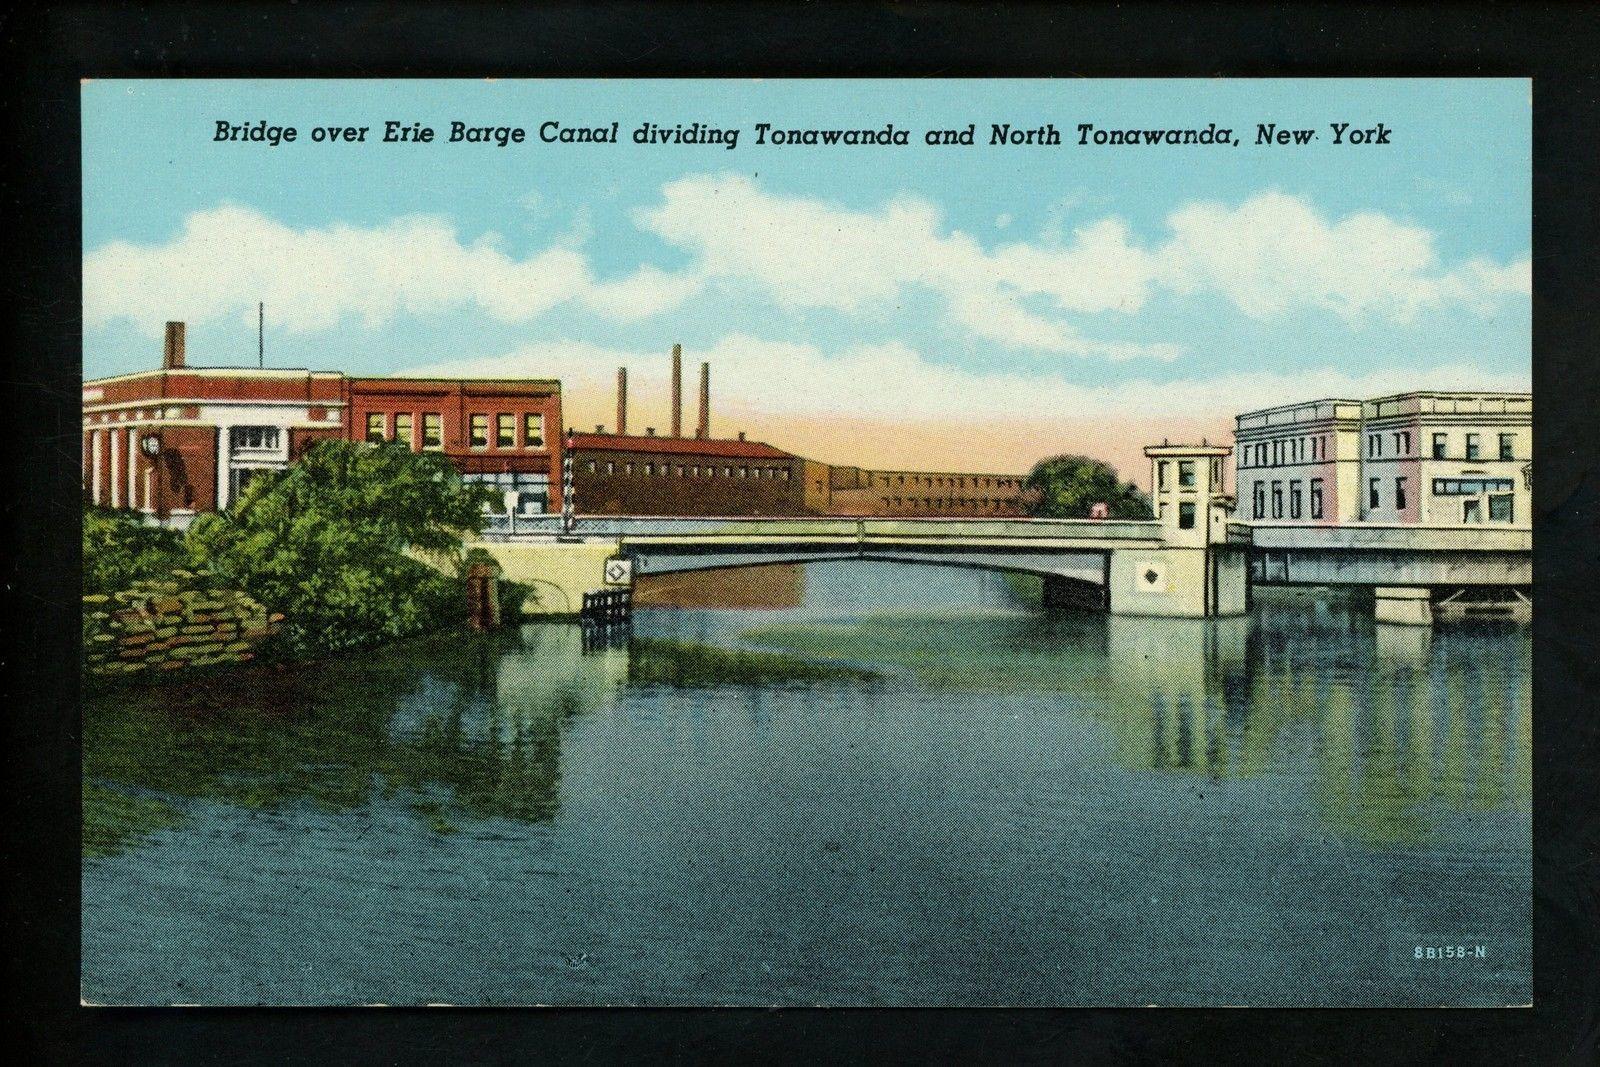 Bridge over Erie Barge Canal, postcard.jpg